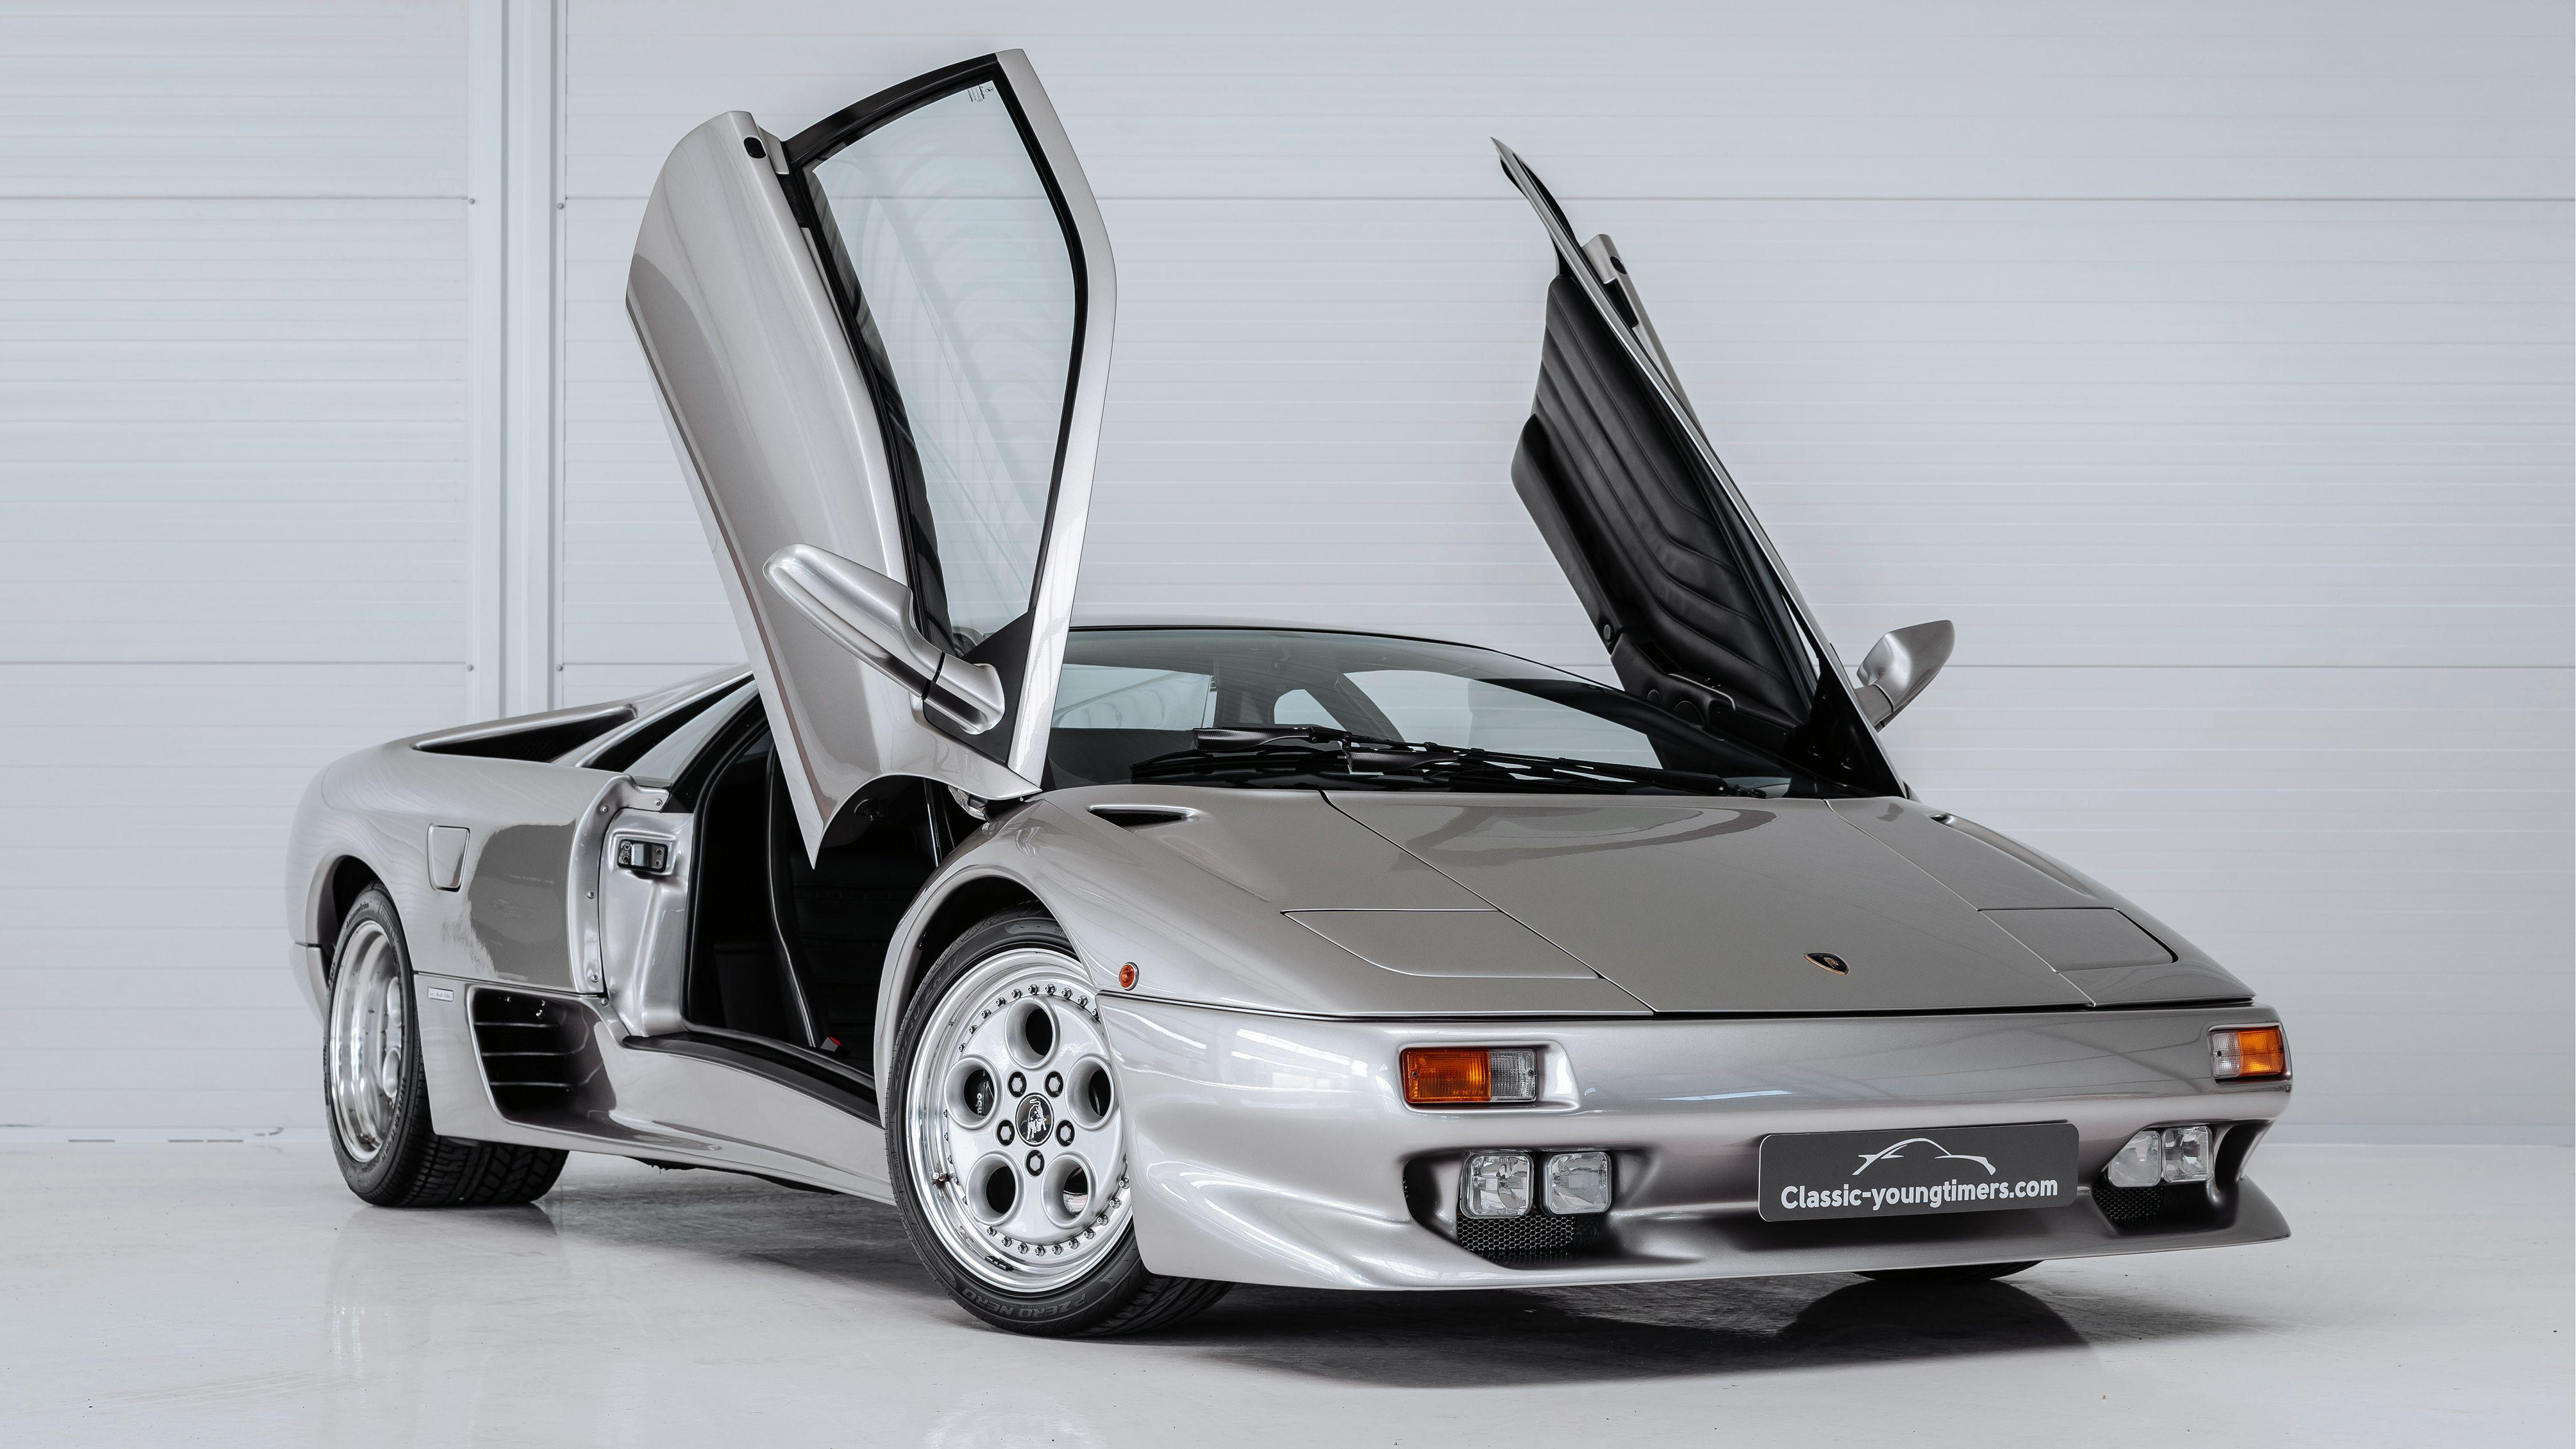 704aa7f7dfab6d6be4c2df05f004a8bd Fabulous Ferrari Mondial T In Vendita Cars Trend